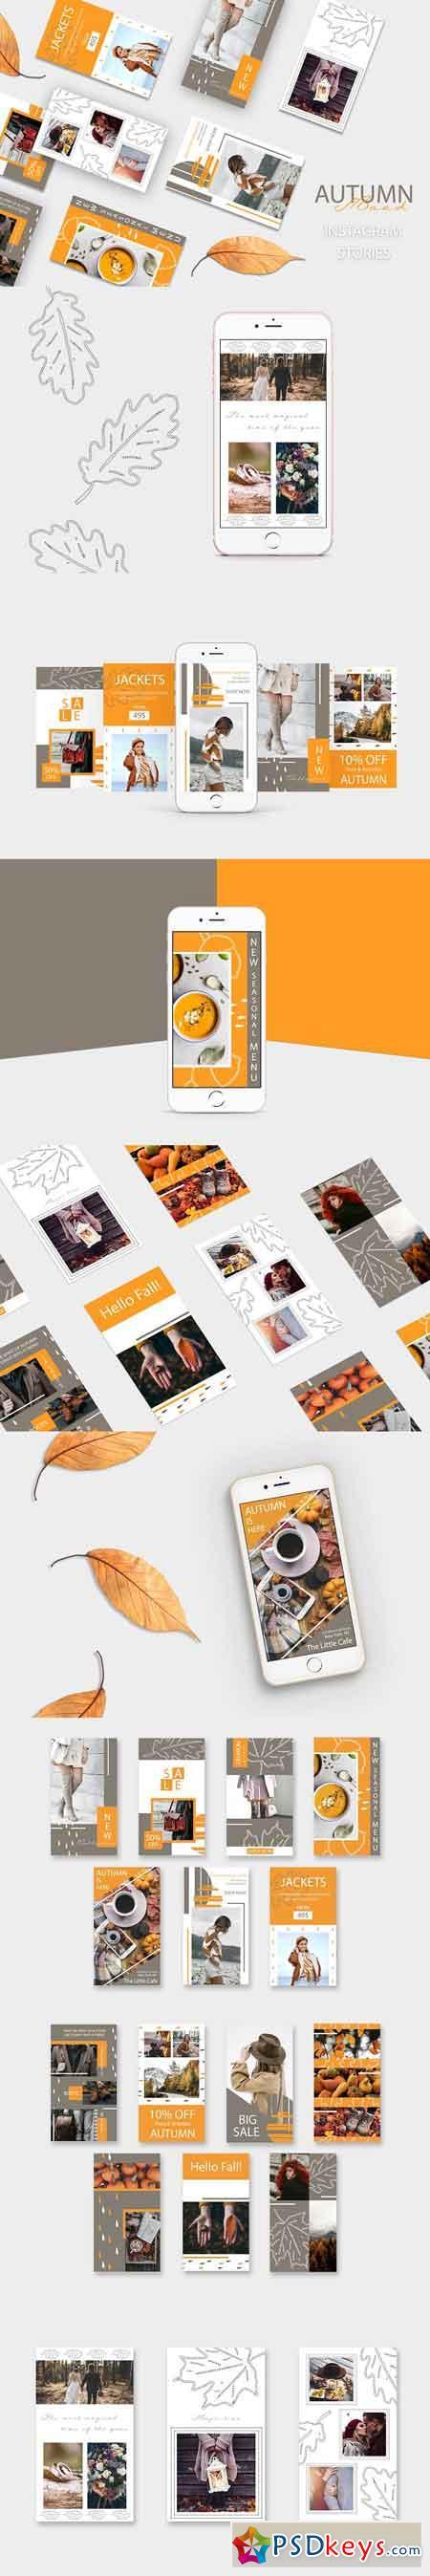 AUTUMN Mood - Instagram Stories Pack 2926091